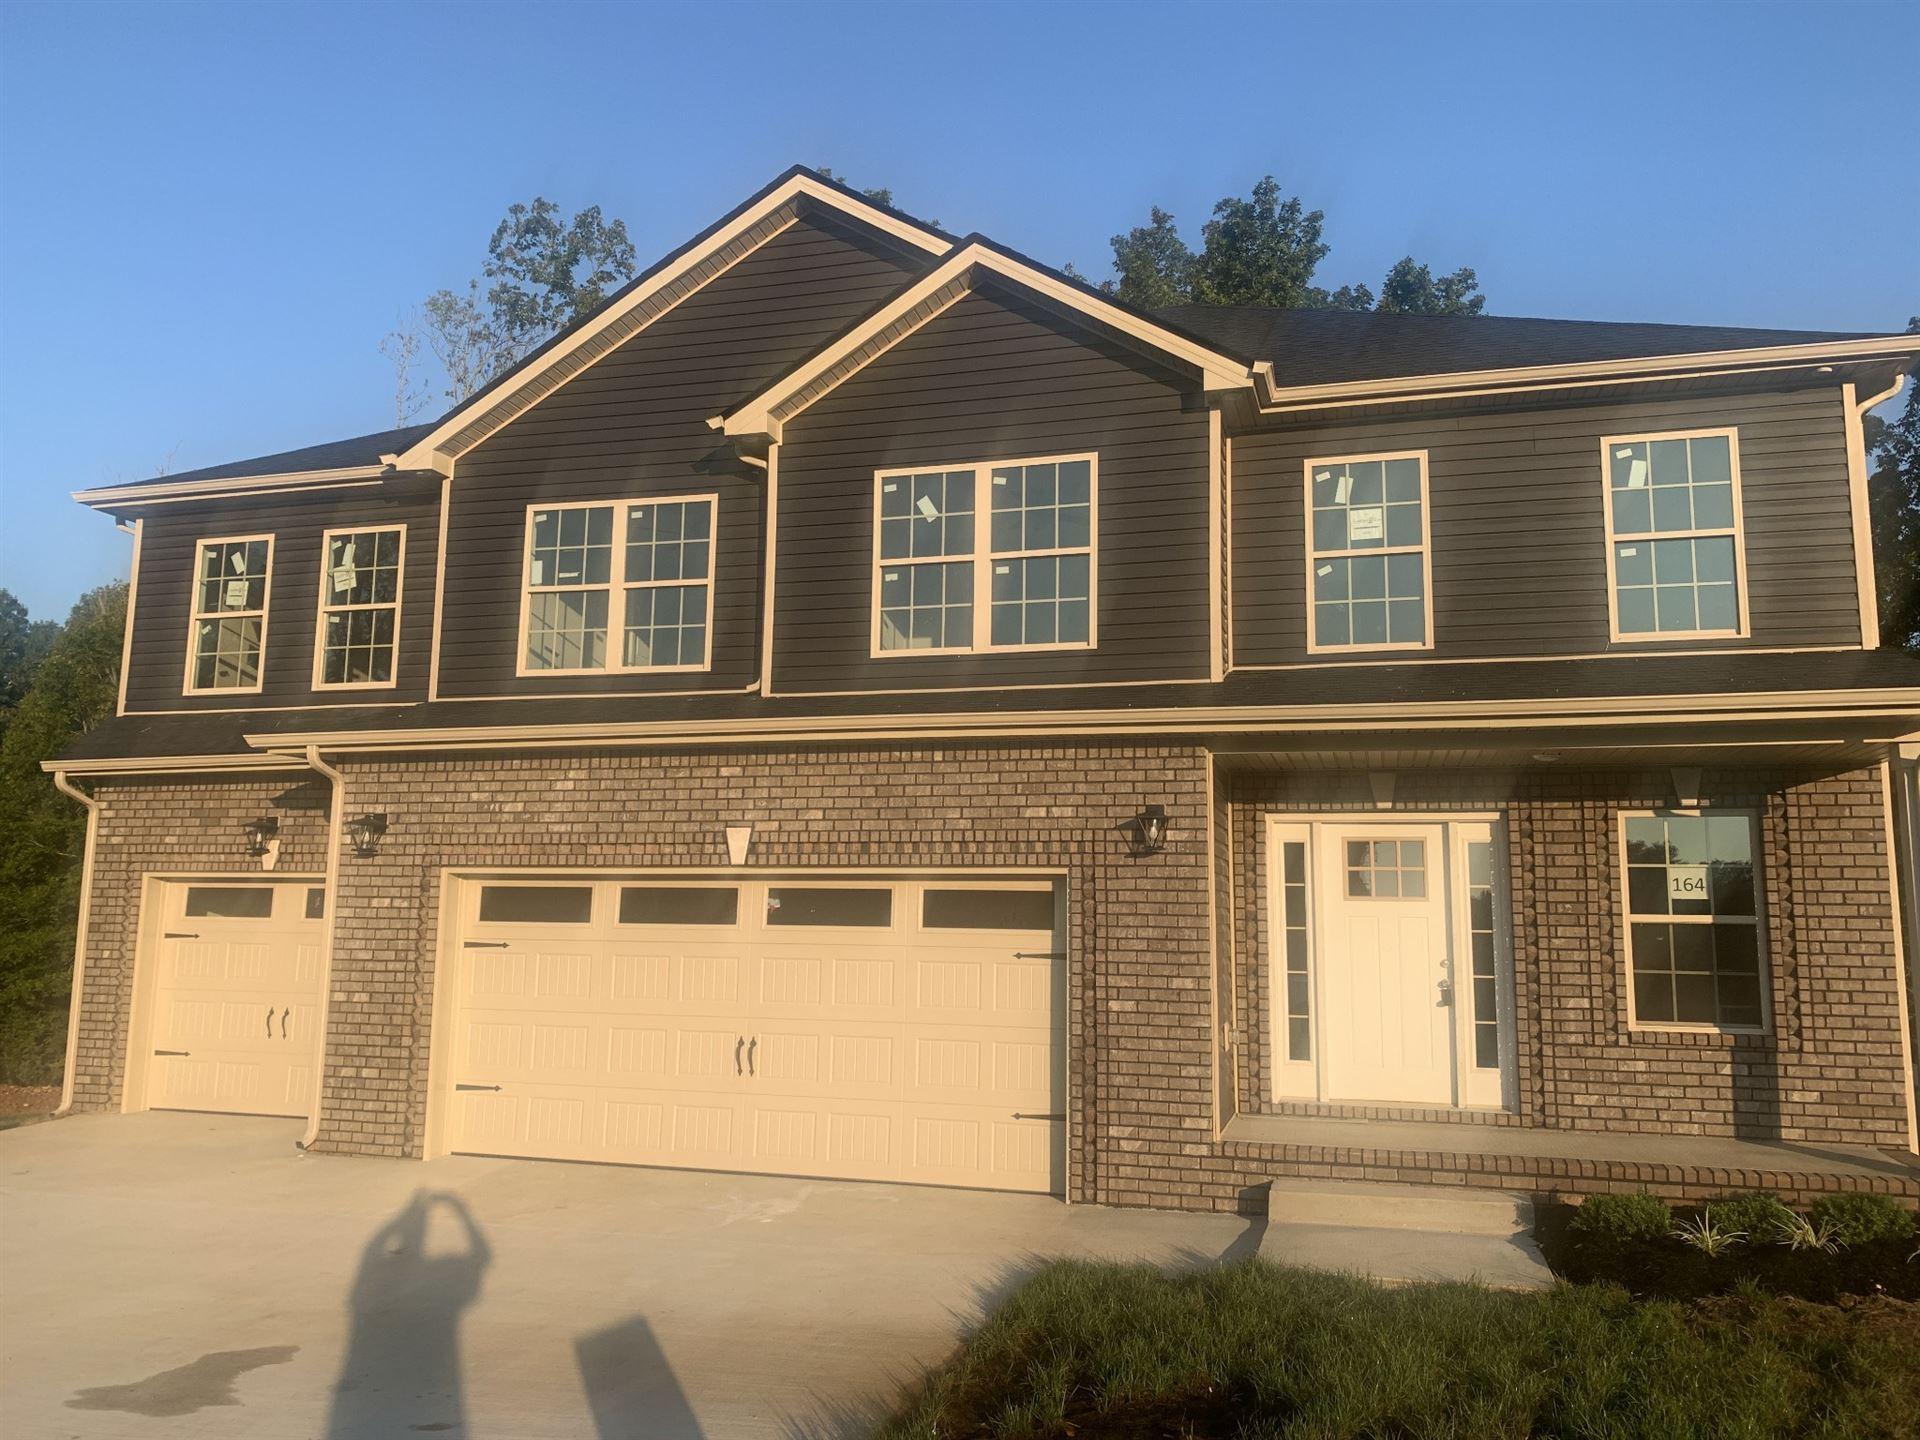 164 GLENSTONE, Clarksville, TN 37043 - MLS#: 2250402